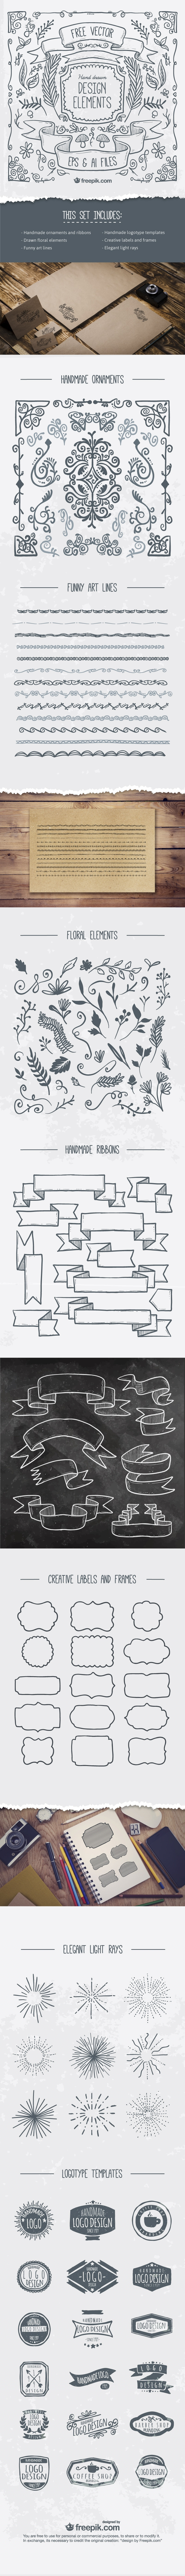 Illustration elements